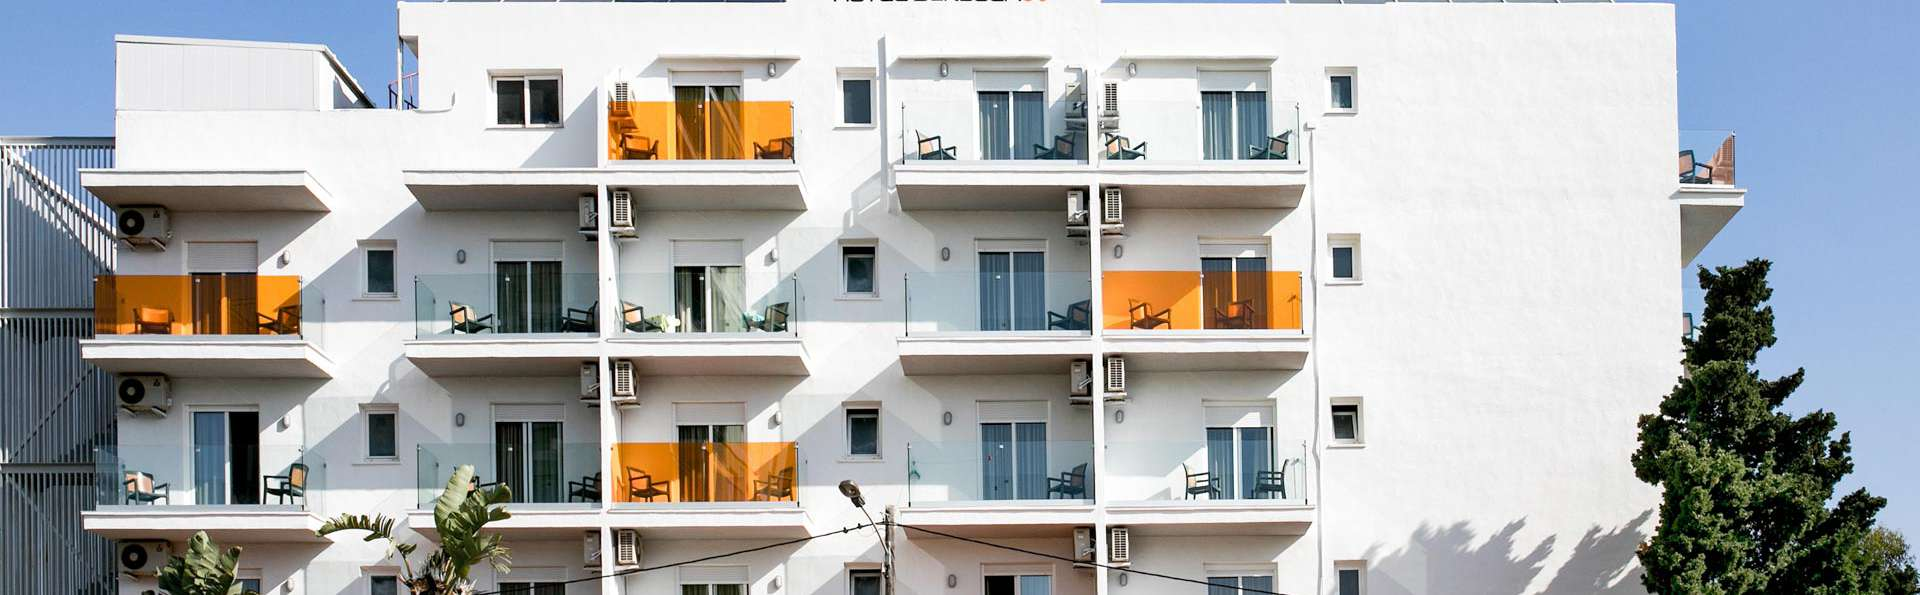 Hotel Bersoca - EDIT_NEW_FRONT_01.jpg